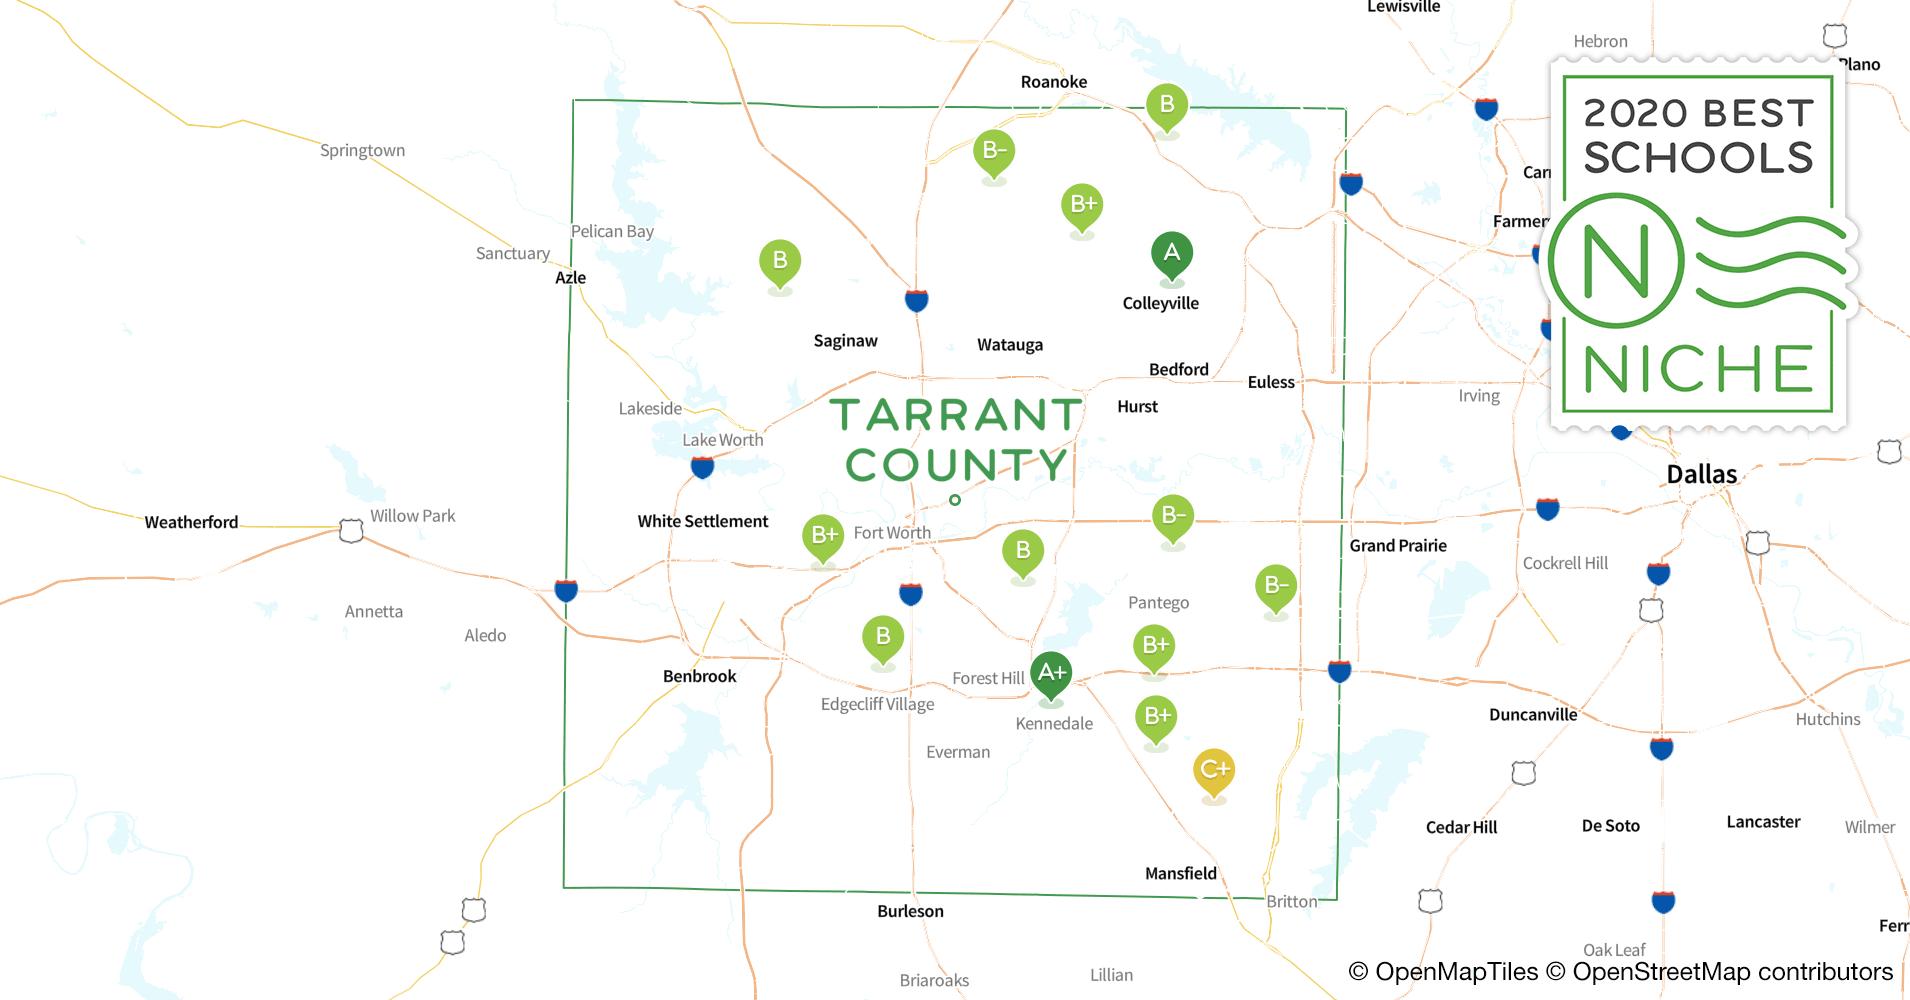 School Districts In Tarrant County Tx Niche